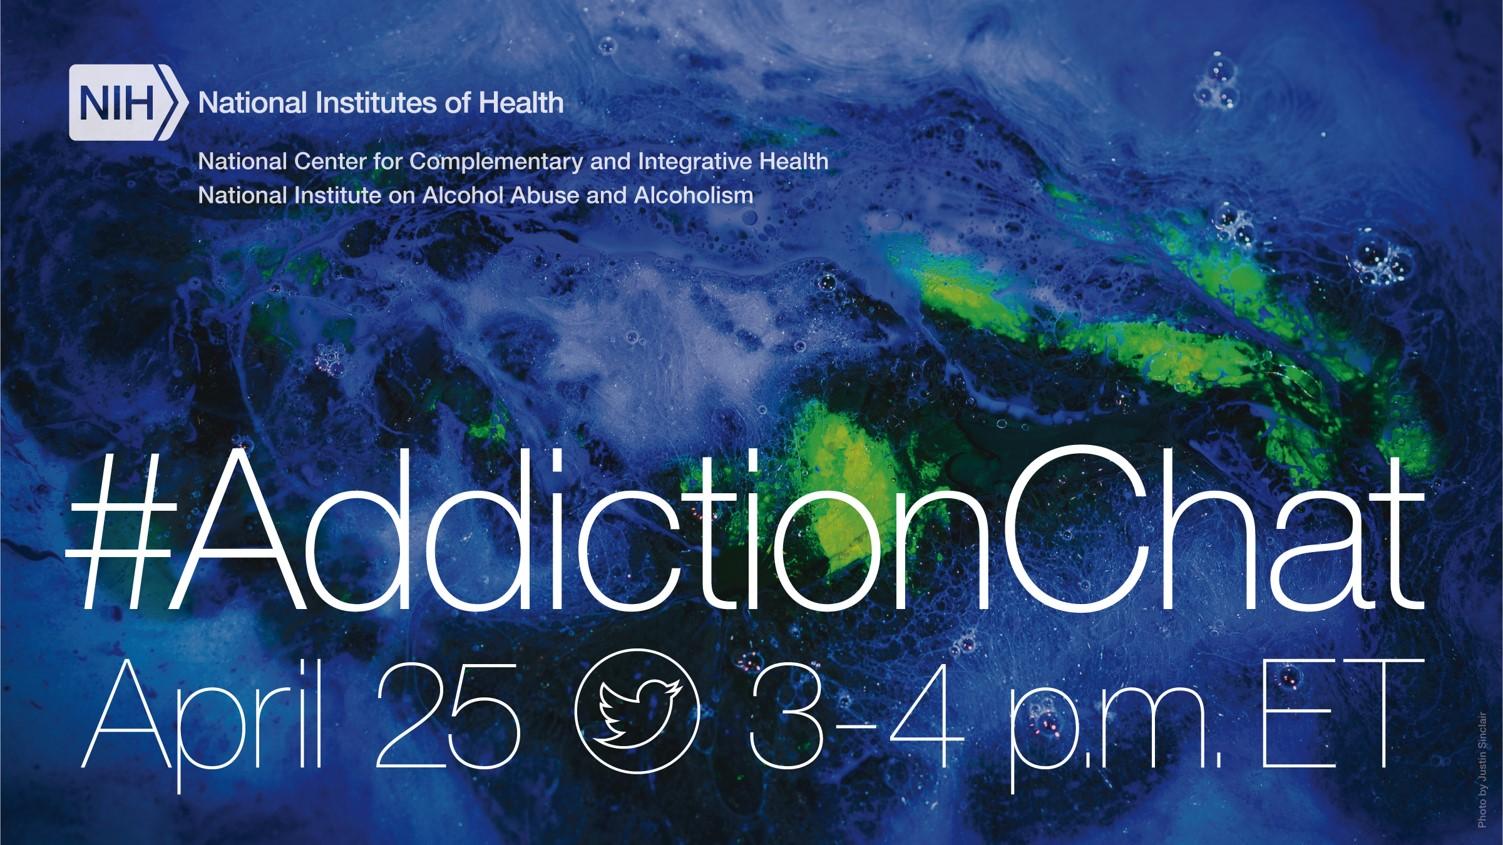 Addiction Twitter Chat 2018